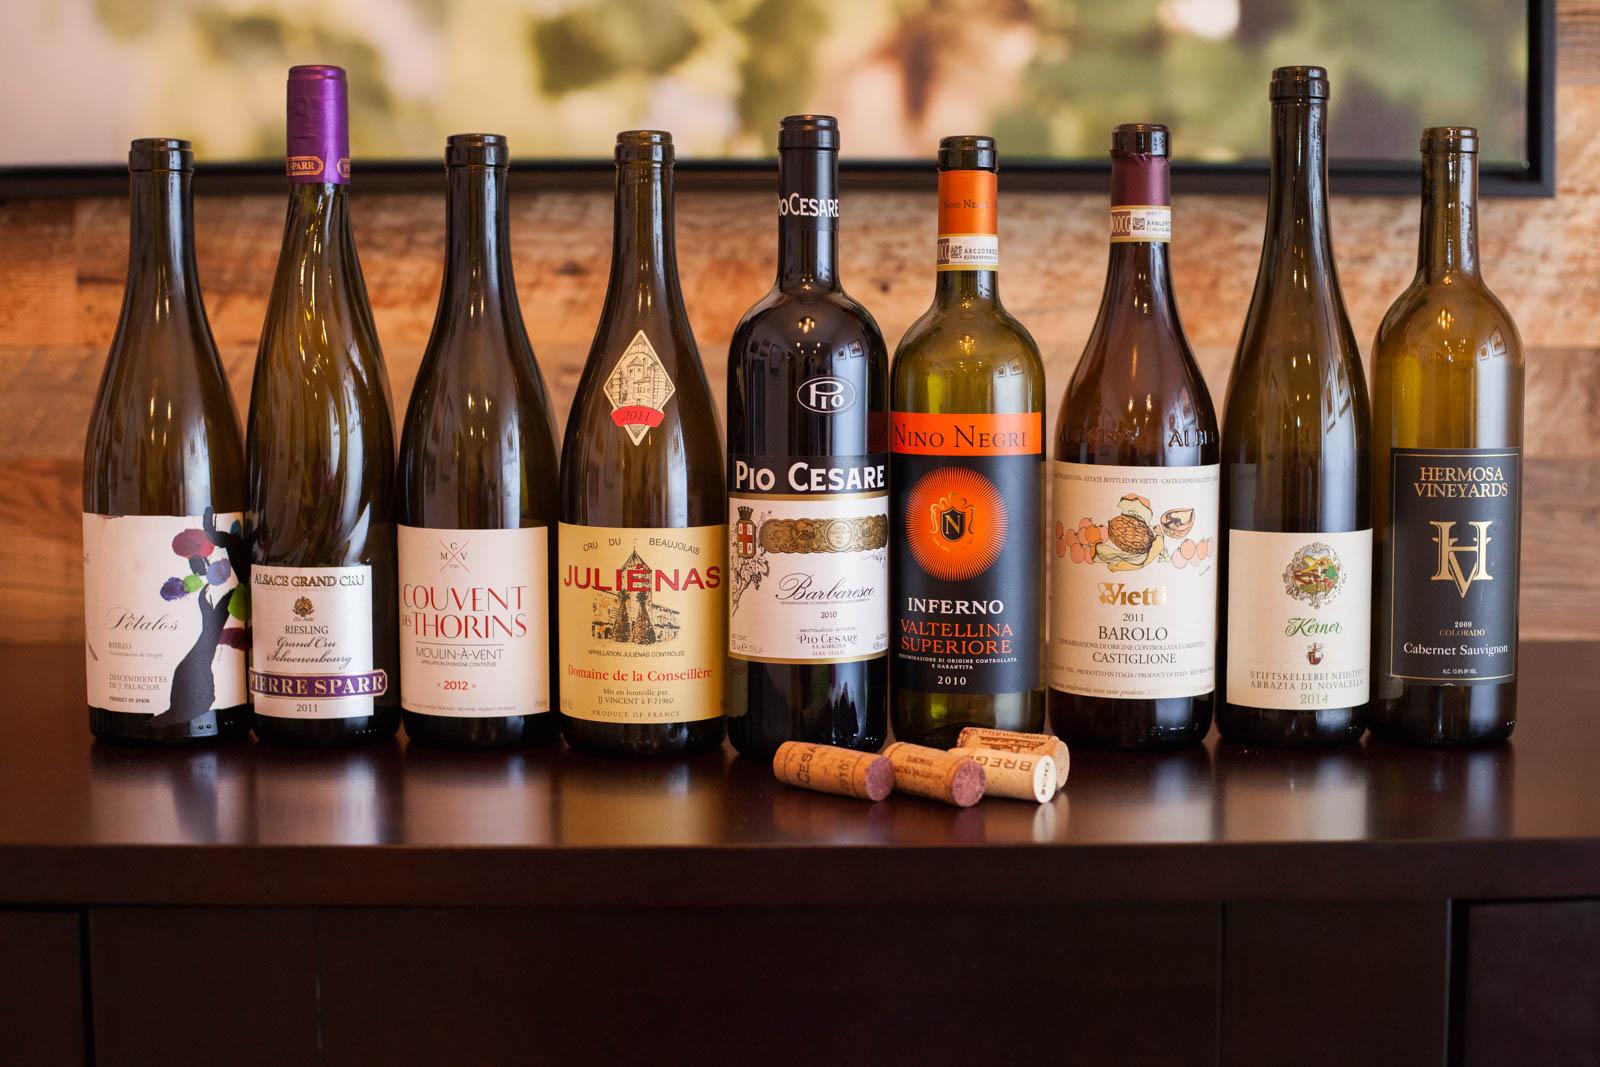 Best Wines of 2015, Opening a Bottle, Pio Cesare Barbaresco